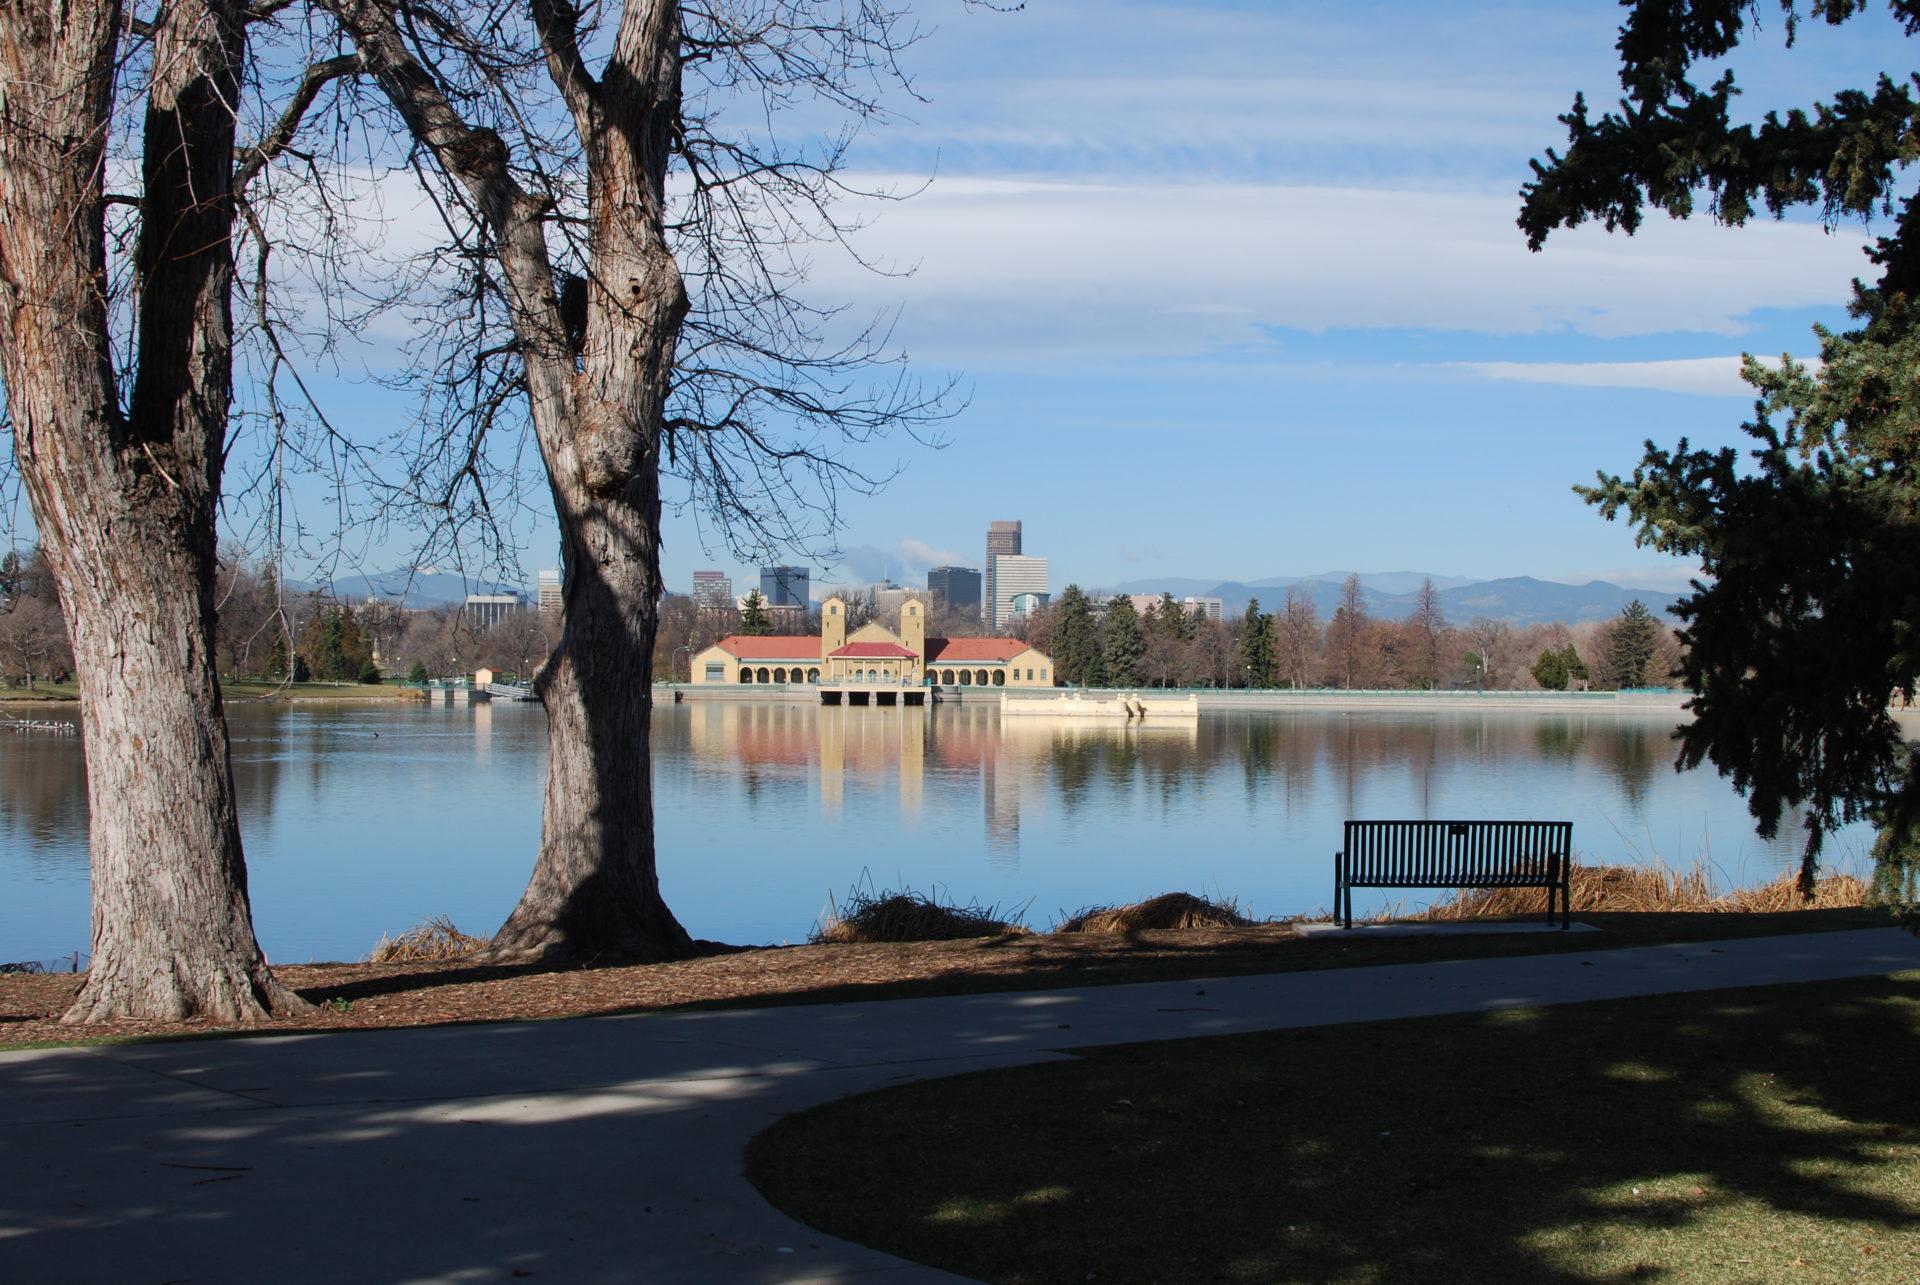 City Park Master Plan Update